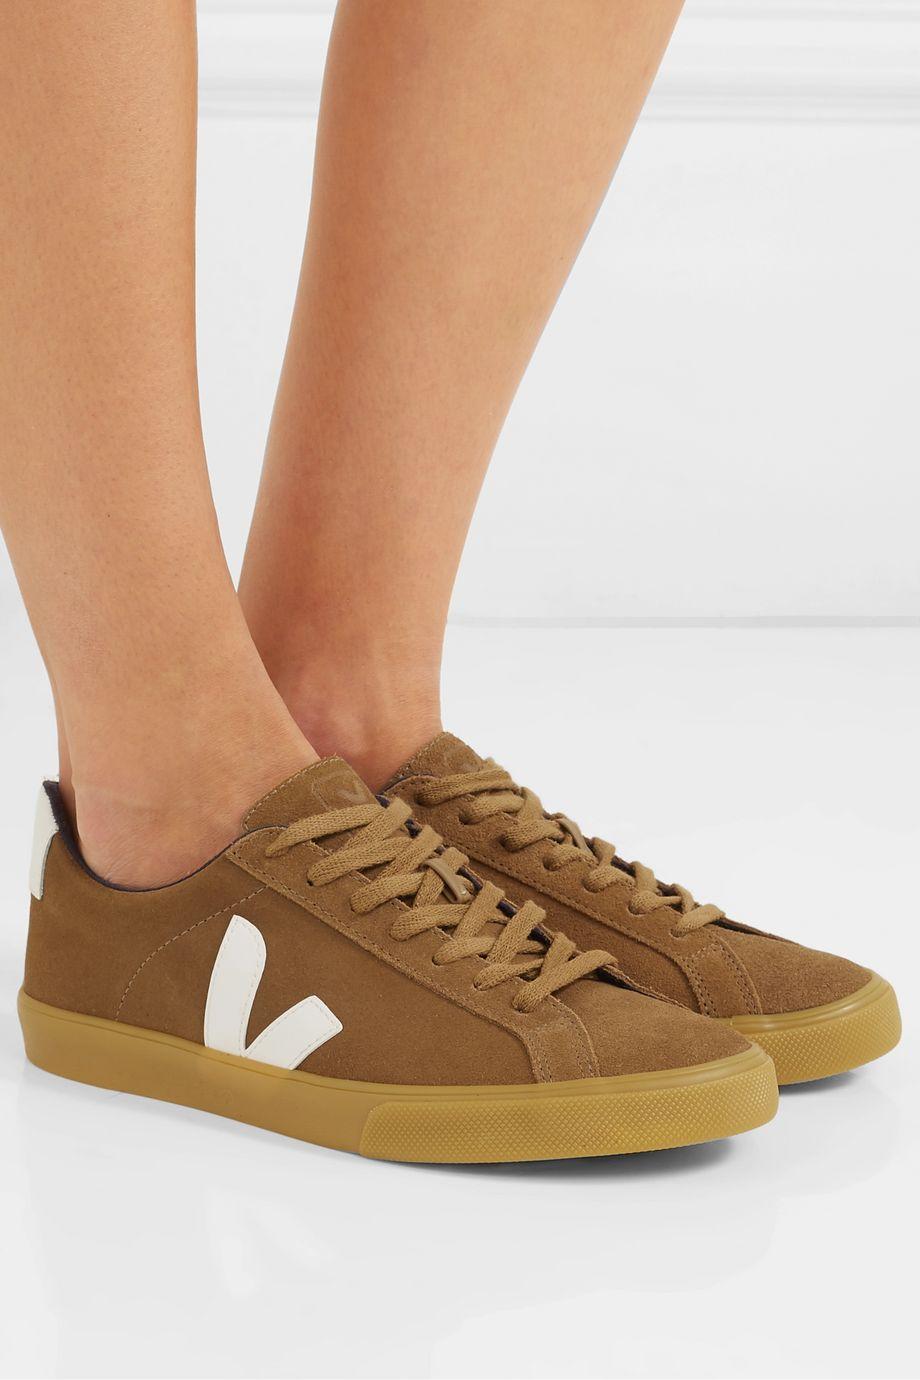 Veja + NET SUSTAIN Esplar leather-trimmed suede sneakers